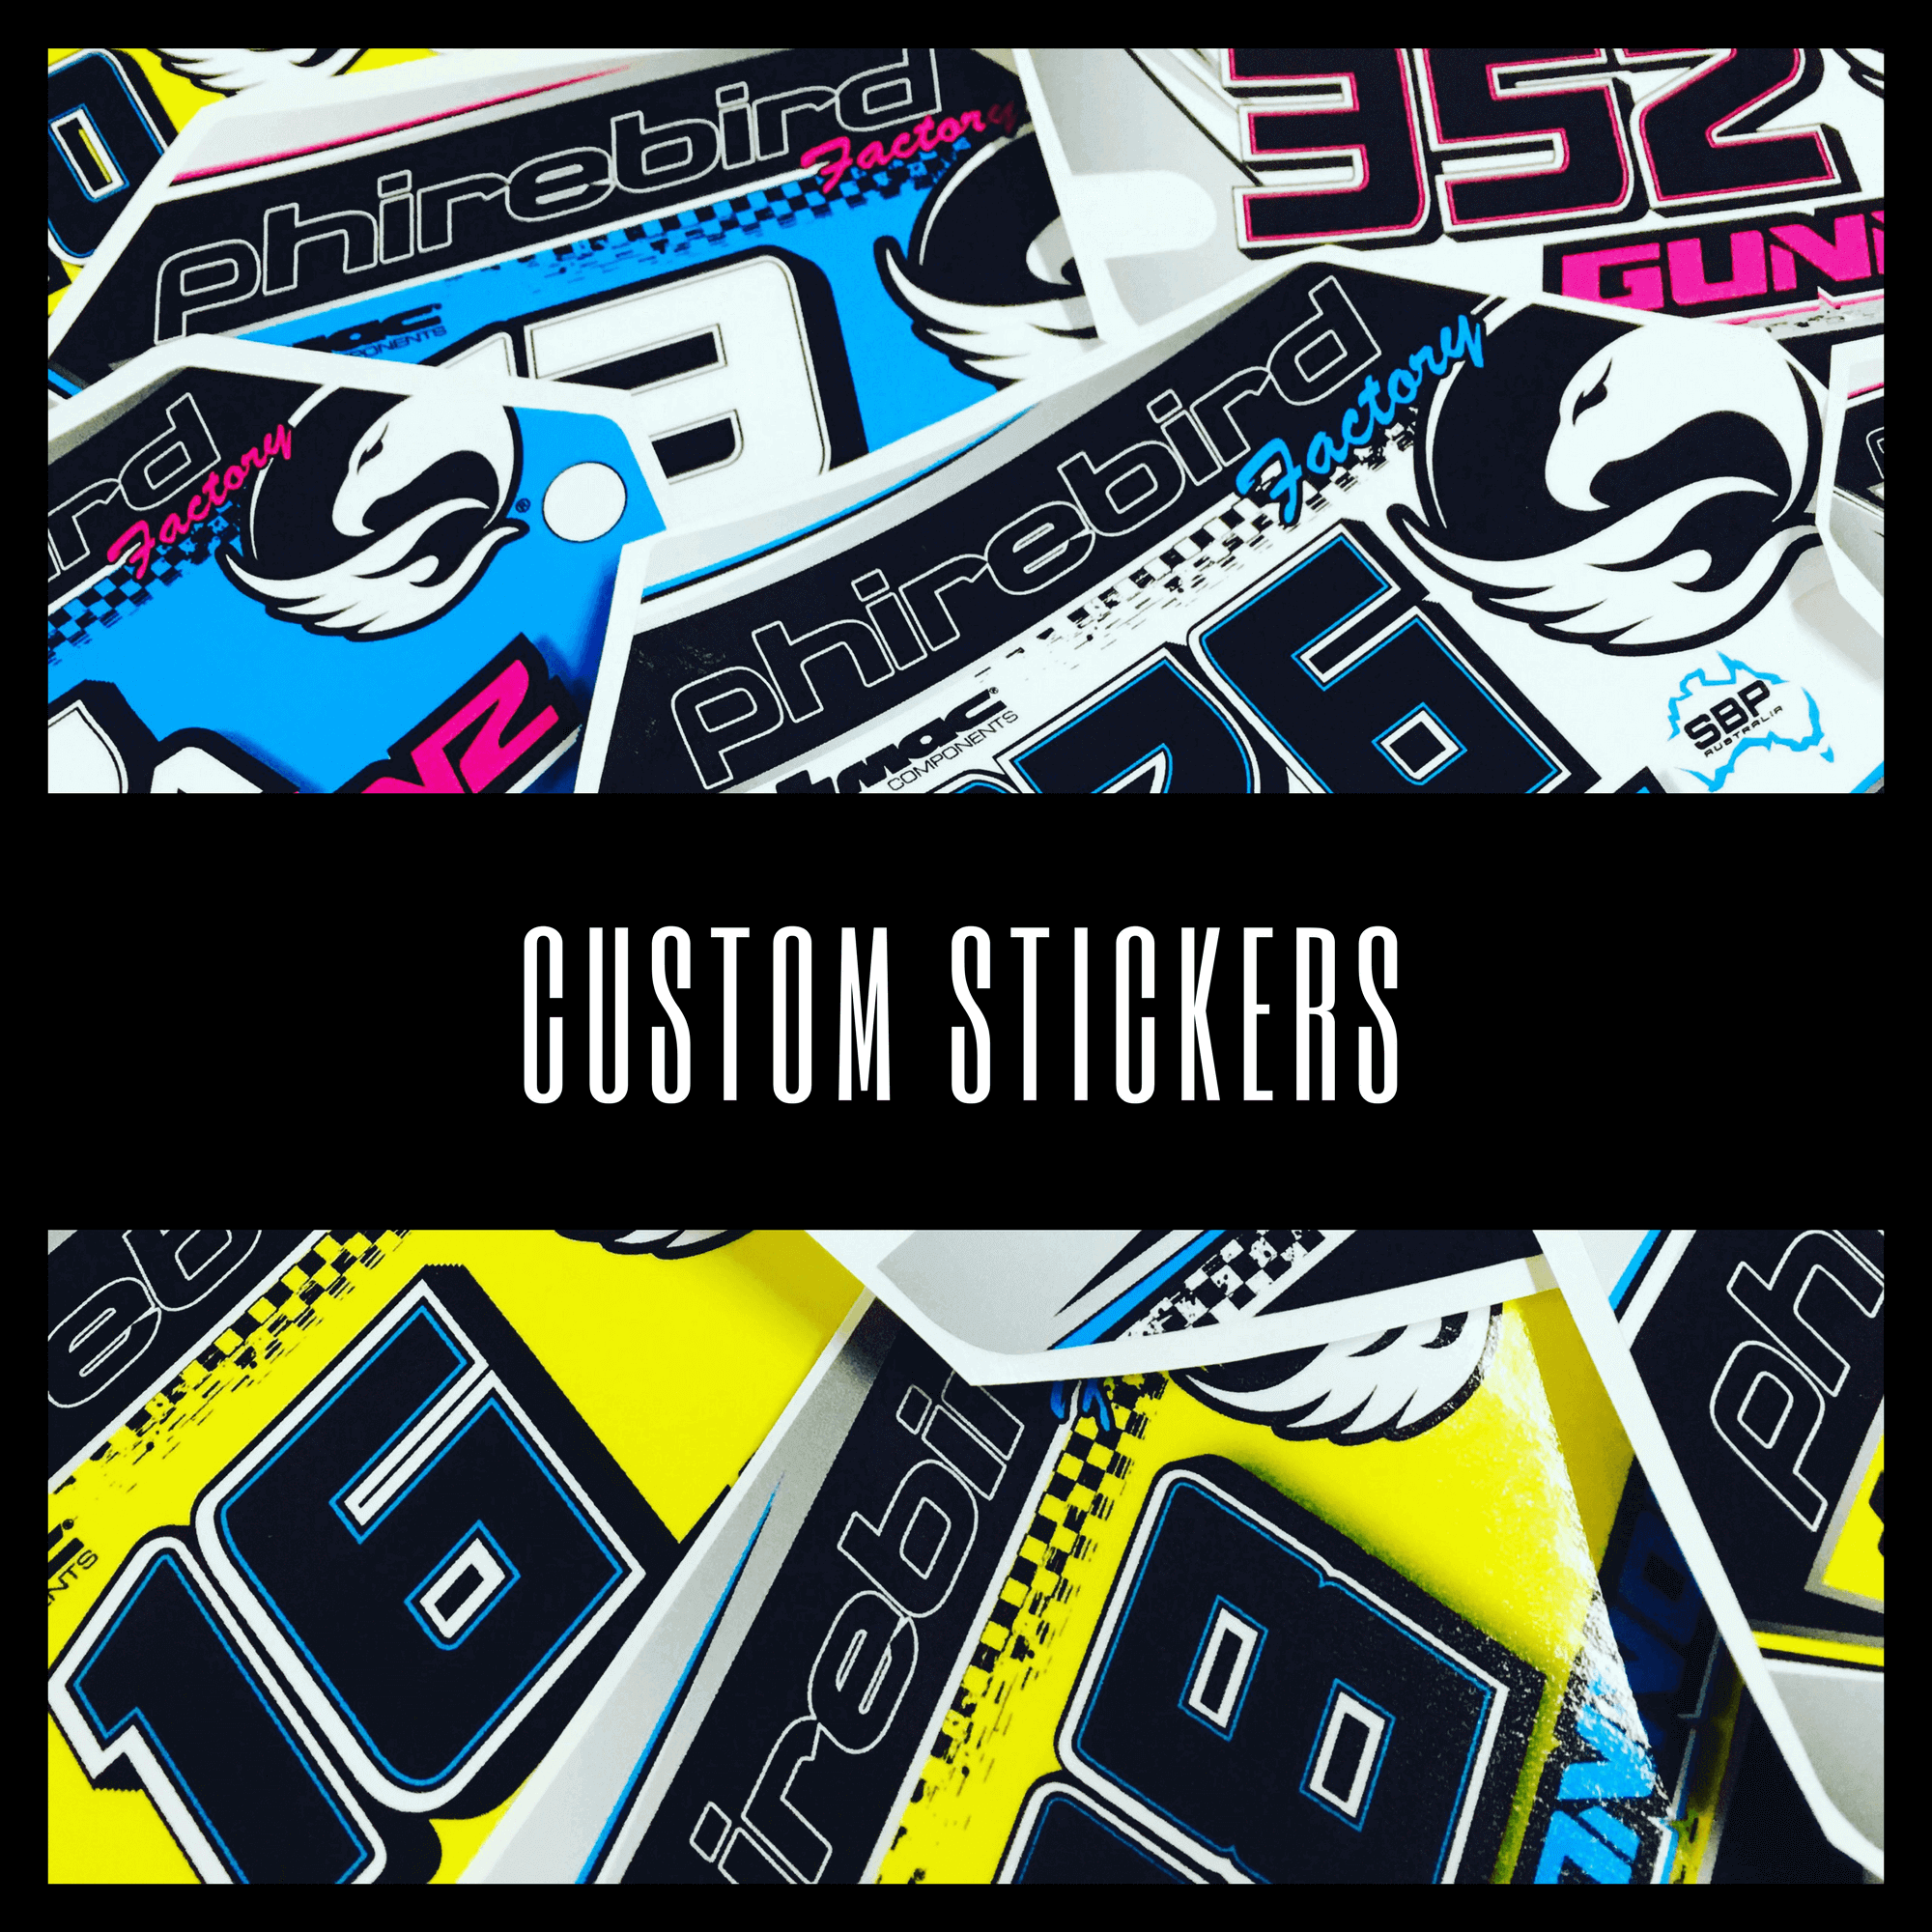 CUSTOM BMX STICKERS PHIREBIRD - Custom bmx stickers